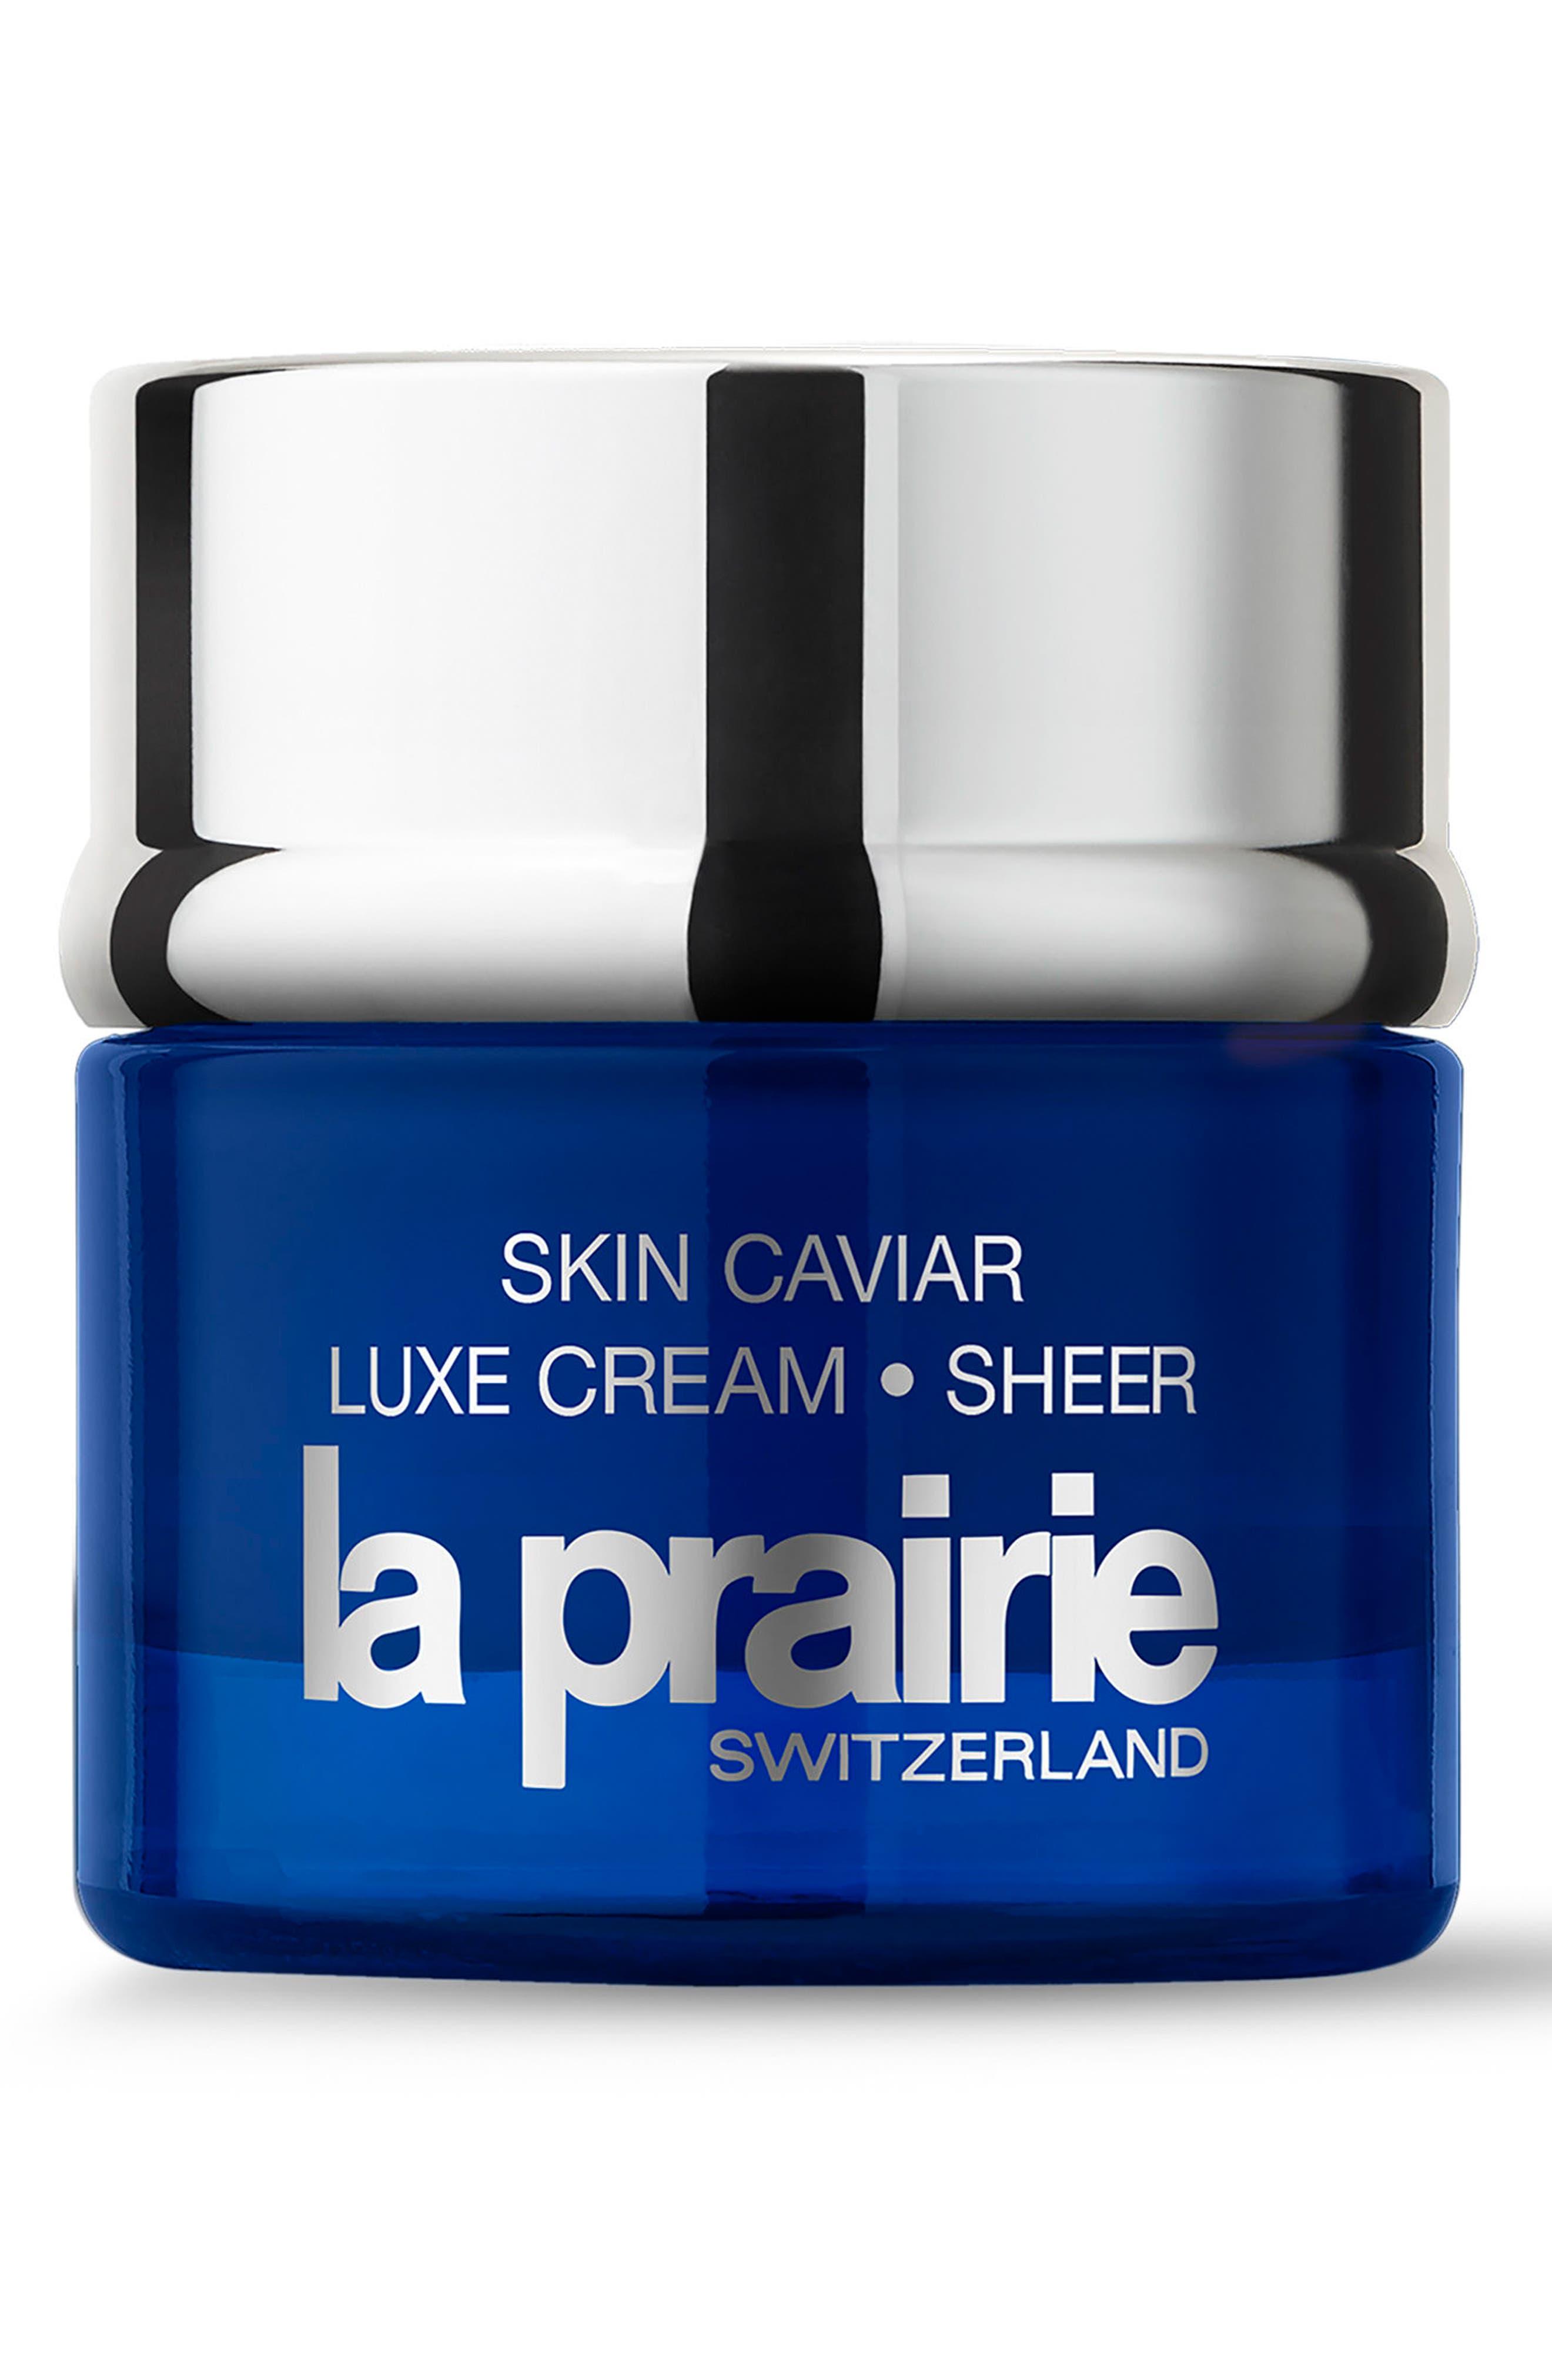 Skin Caviar Luxe Cream Sheer,                         Main,                         color, No Color